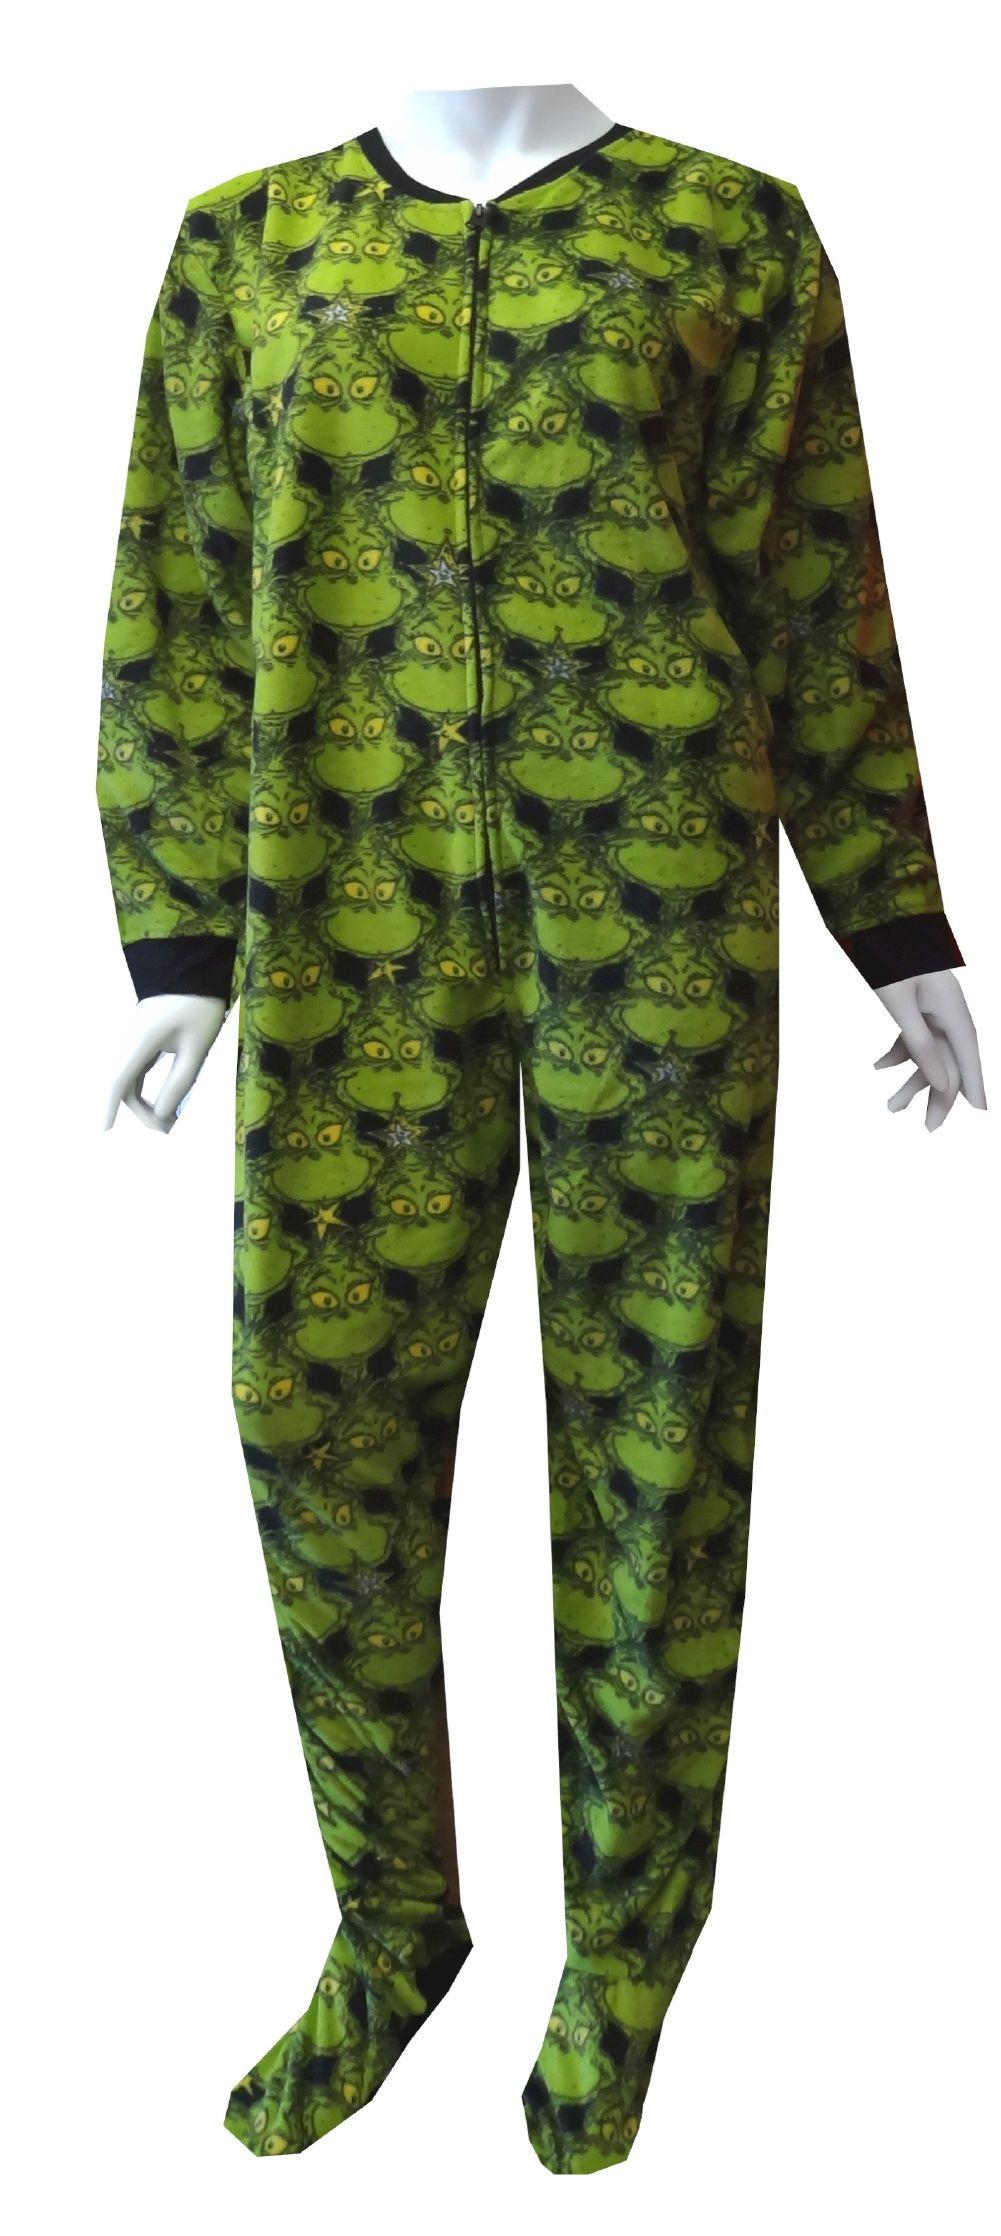 2d85870e0fed Dr Seuss Wicked Grinch Onesie Footie Pajama Looks like he has a ...